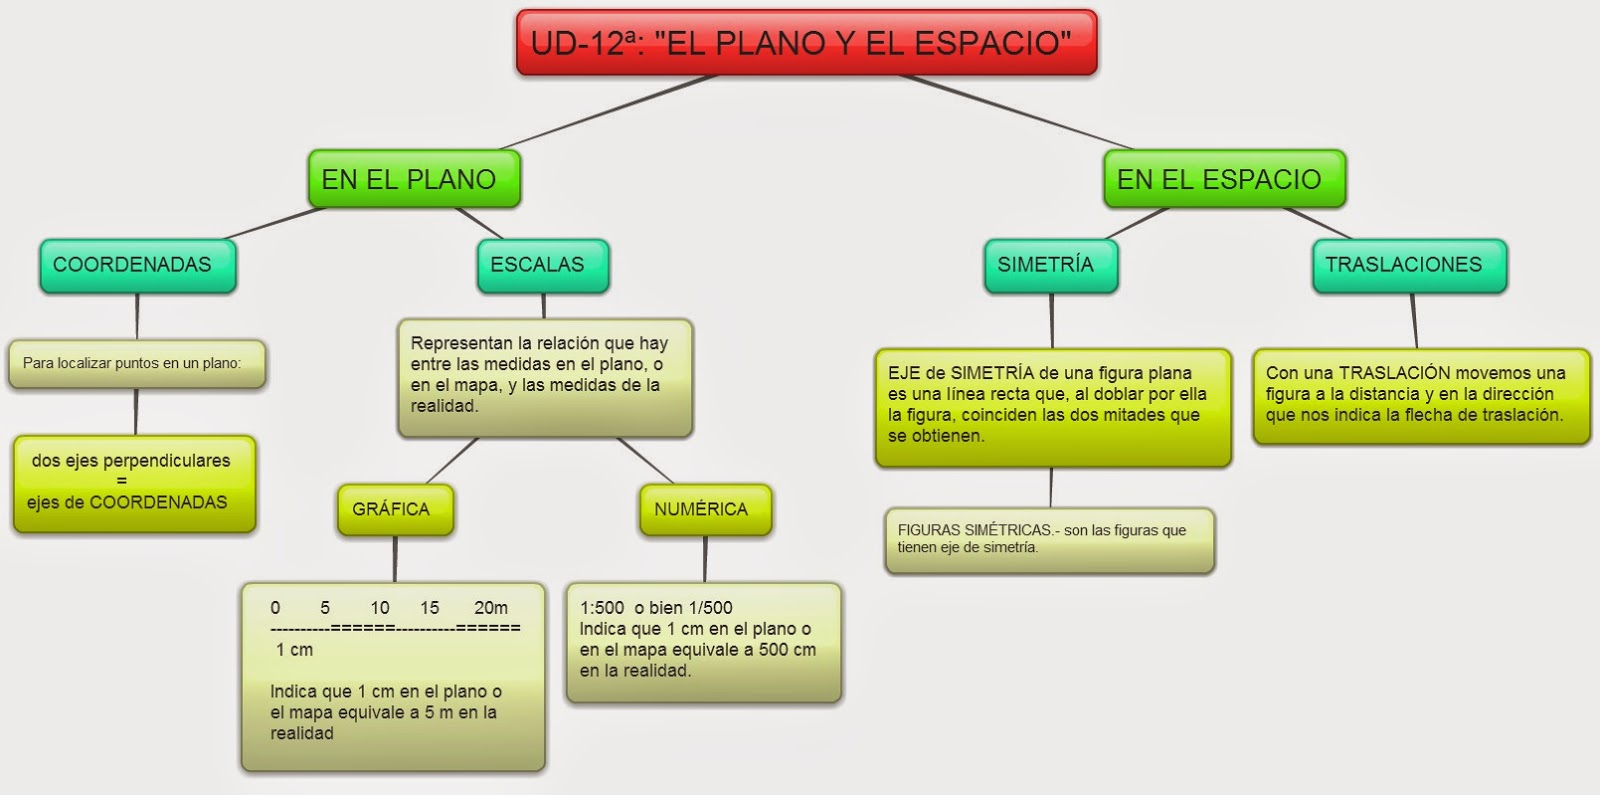 EQUIPO -5ºNIVEL- HERENCIA : MATEMÁTICAS: UD 12ª - \